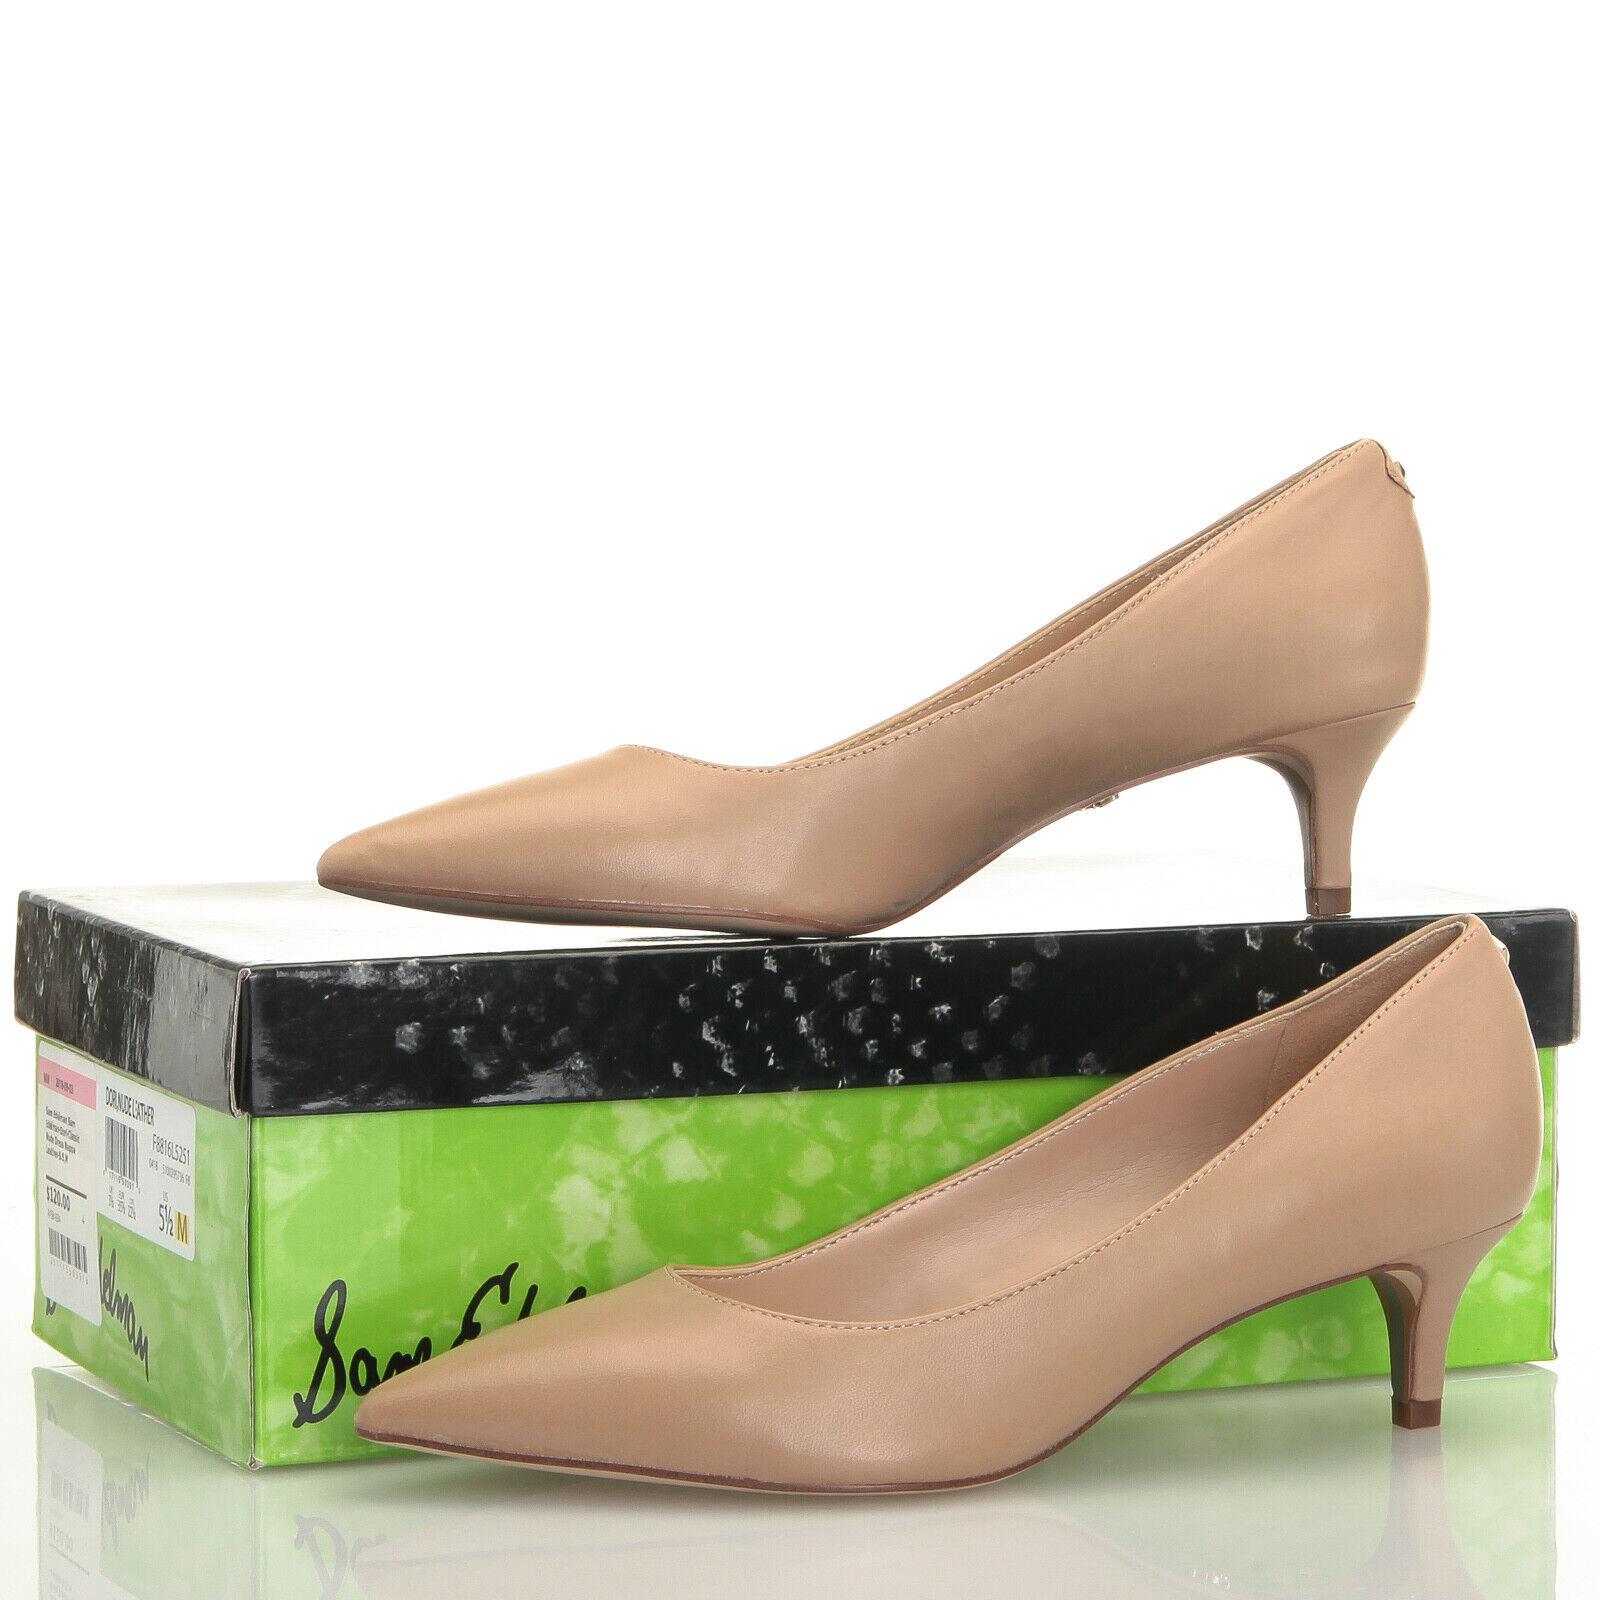 Sam Edelman Dori Nude Beige Nappa Leather Kitten Heels - Size 5.5 M